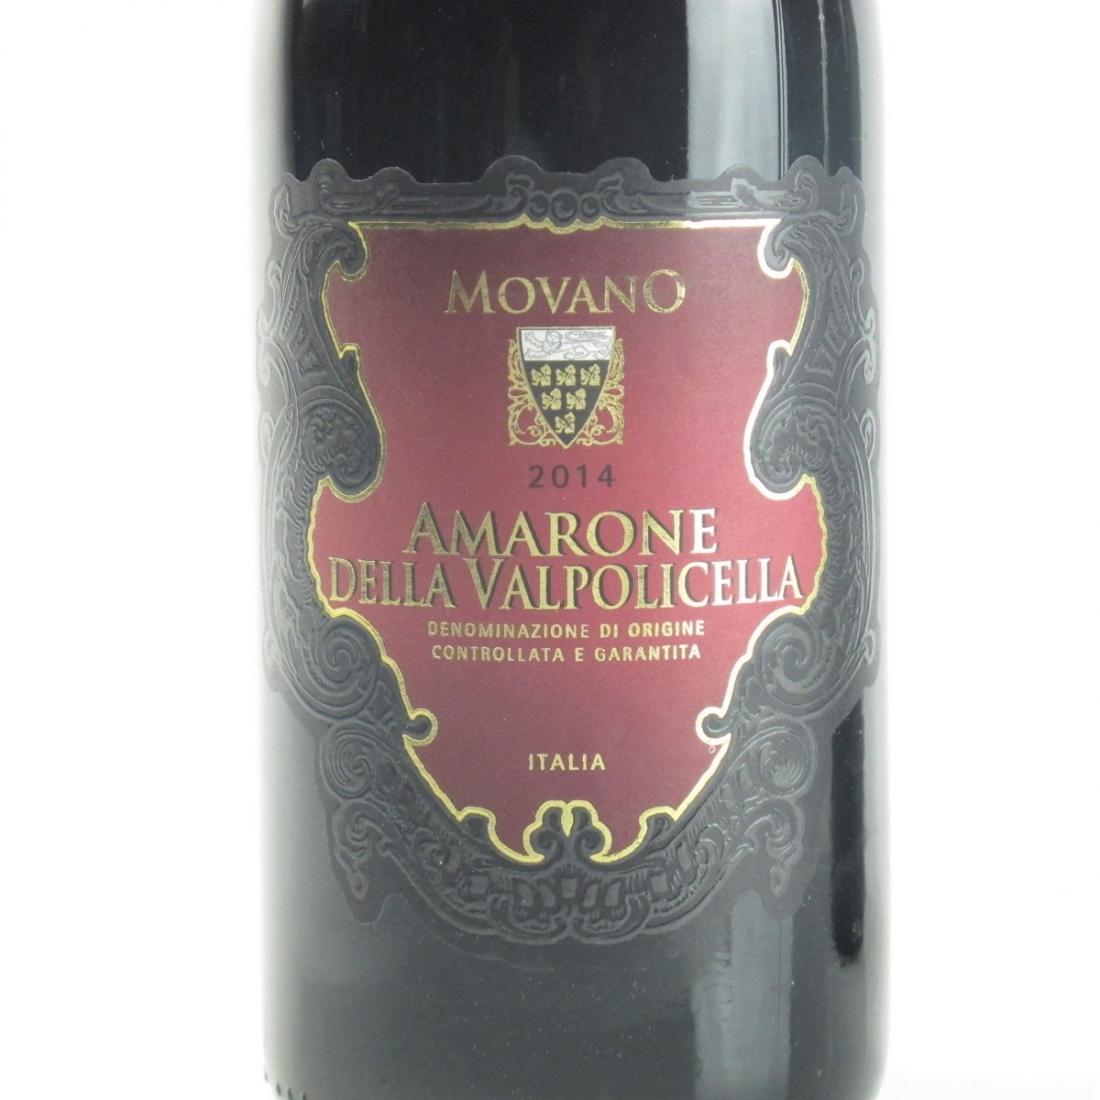 Movano 2014 Amarone 2x75cl